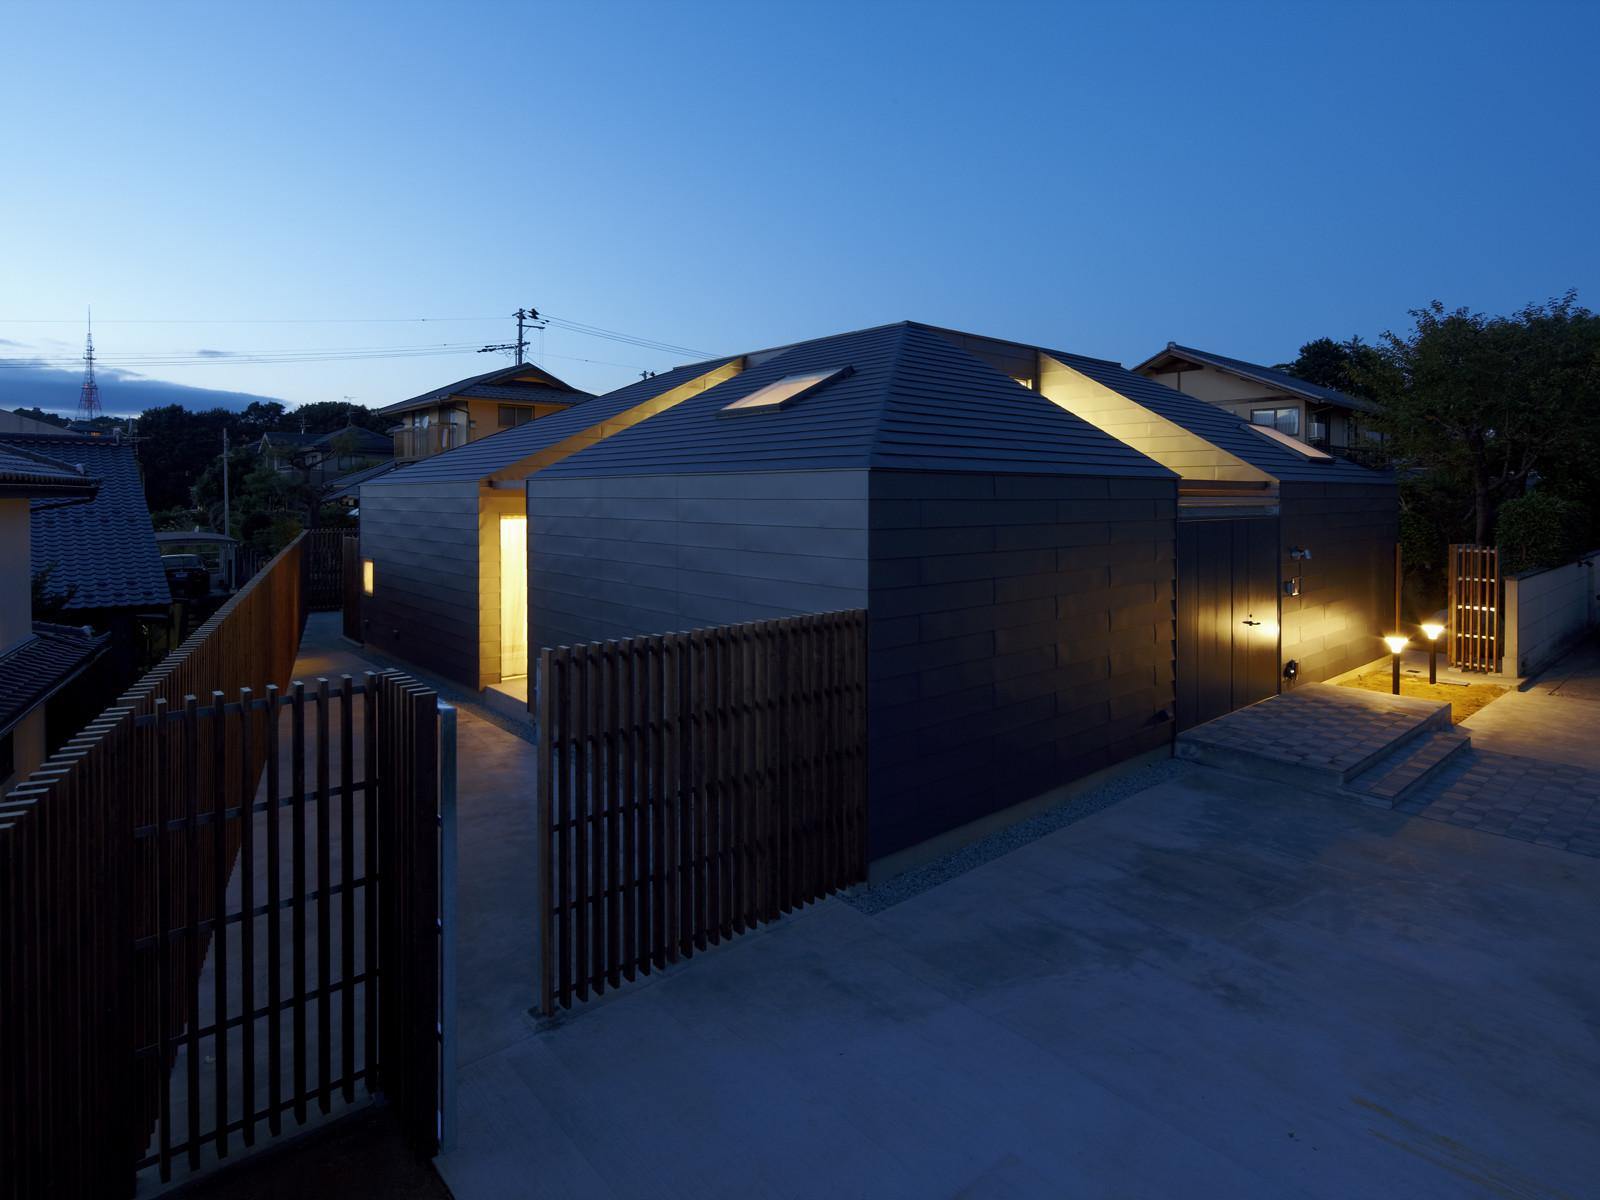 House Yagiyama / Kazuya Saito Architects